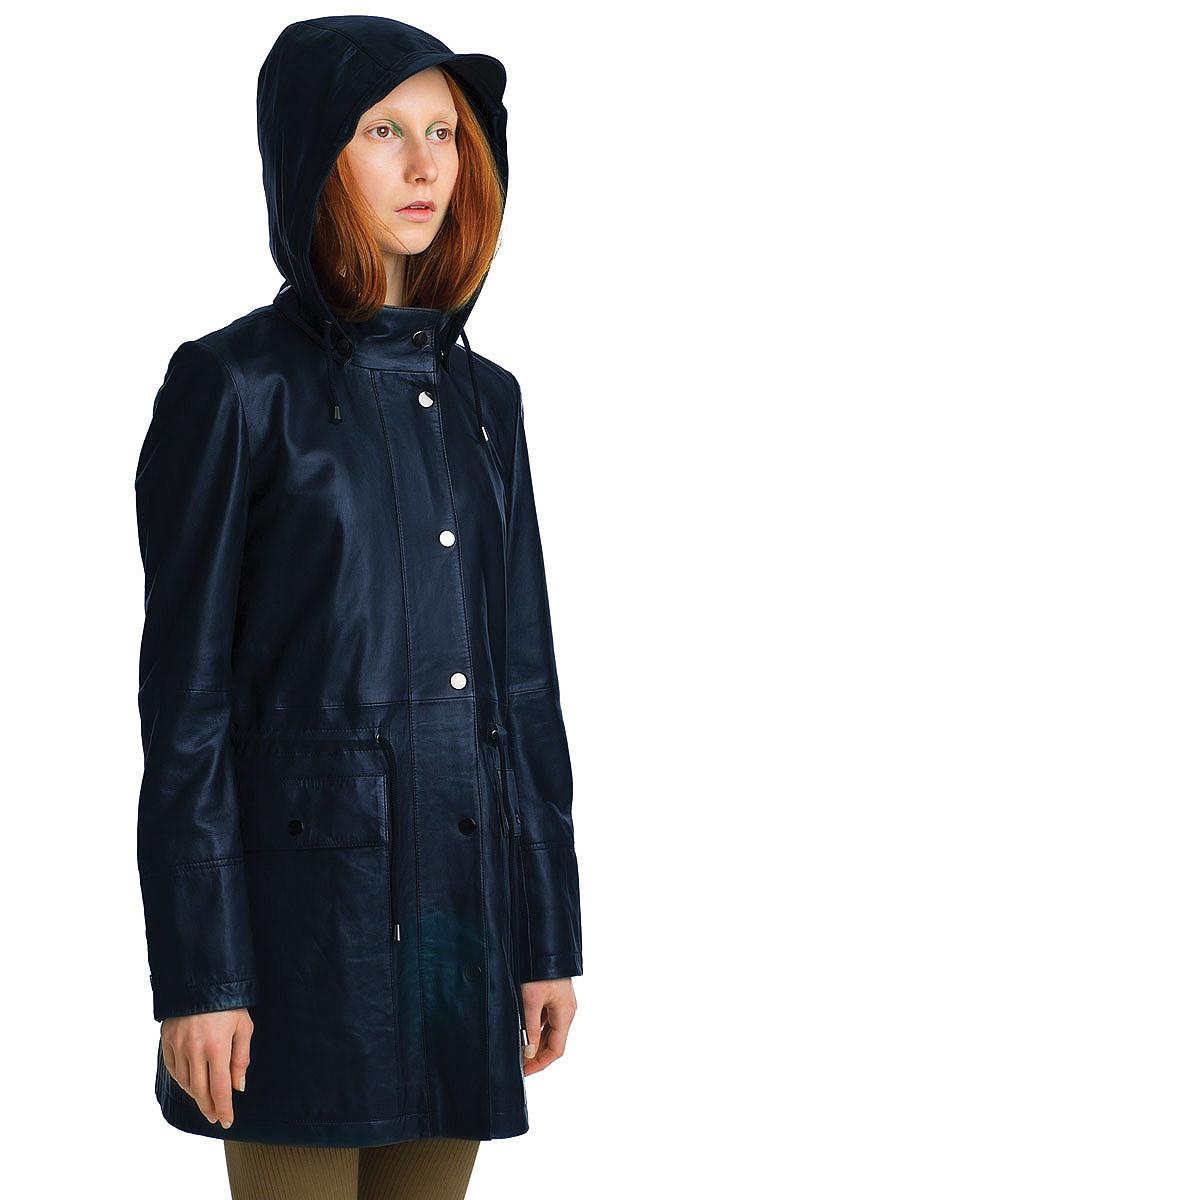 Lumi has produced it in three colors: black, navy blue, and khaki.